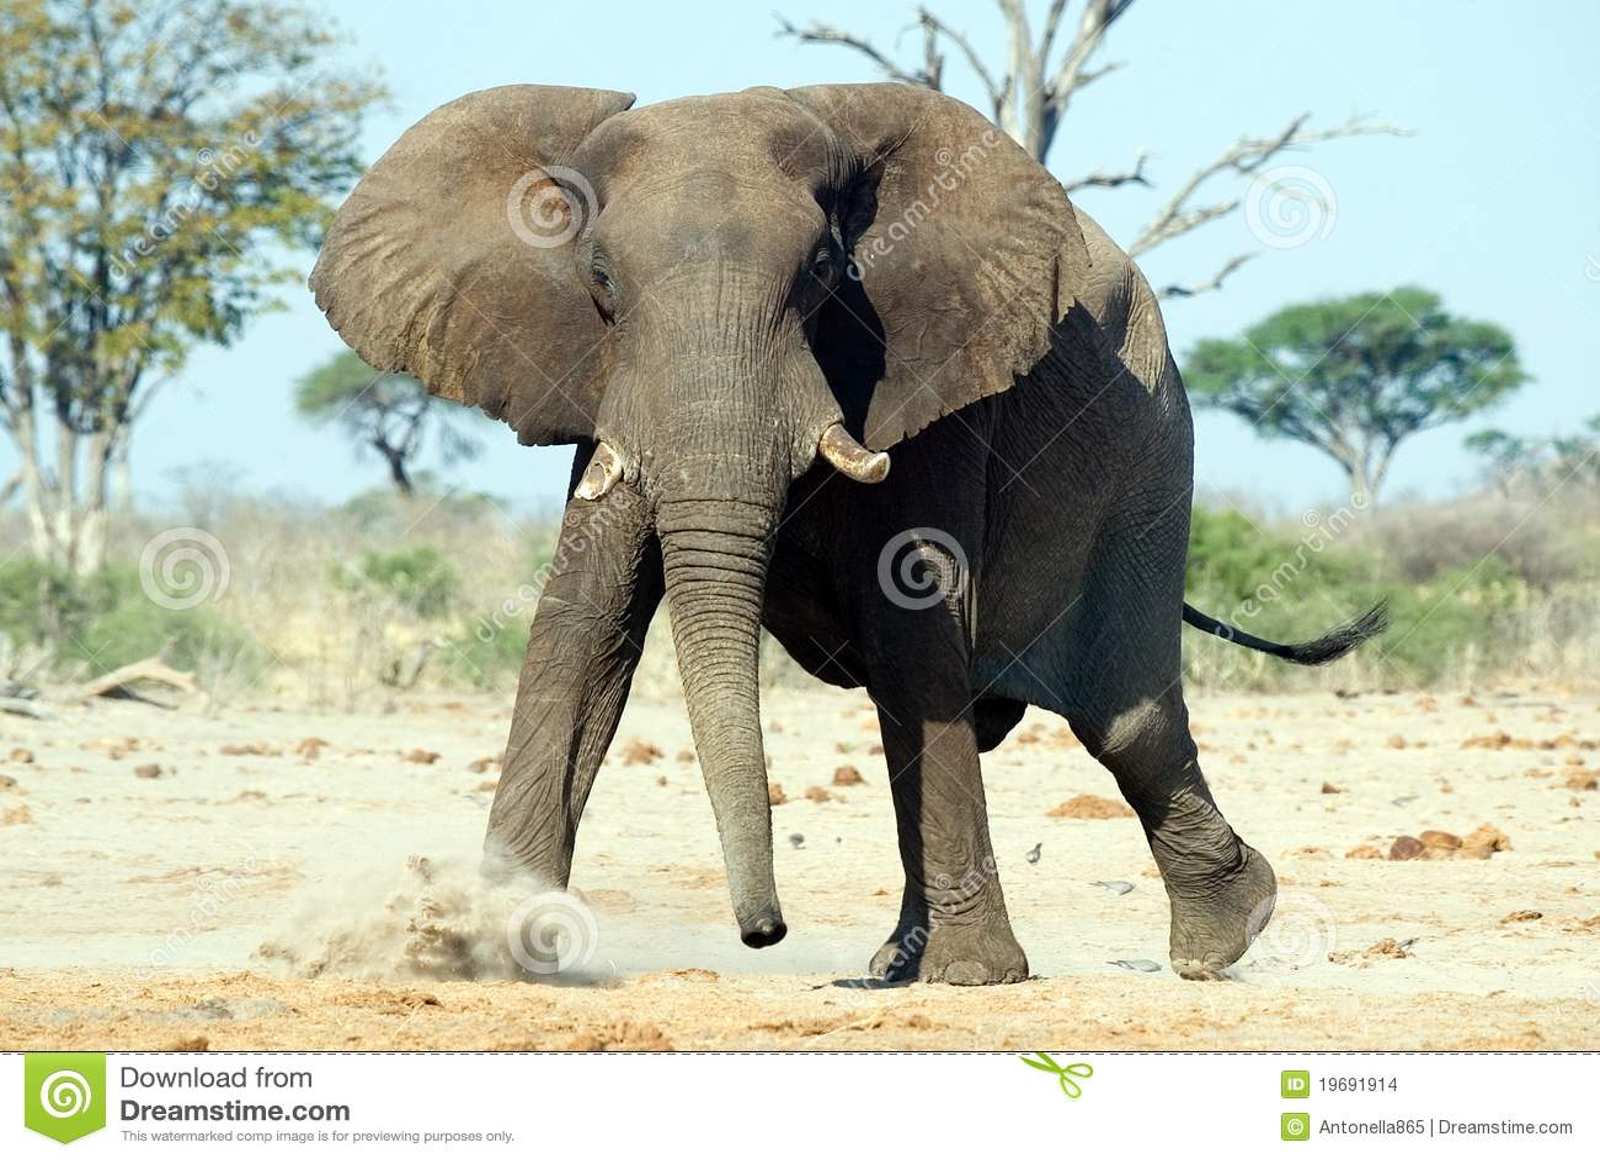 Elefante africano (africana del Loxodonta)